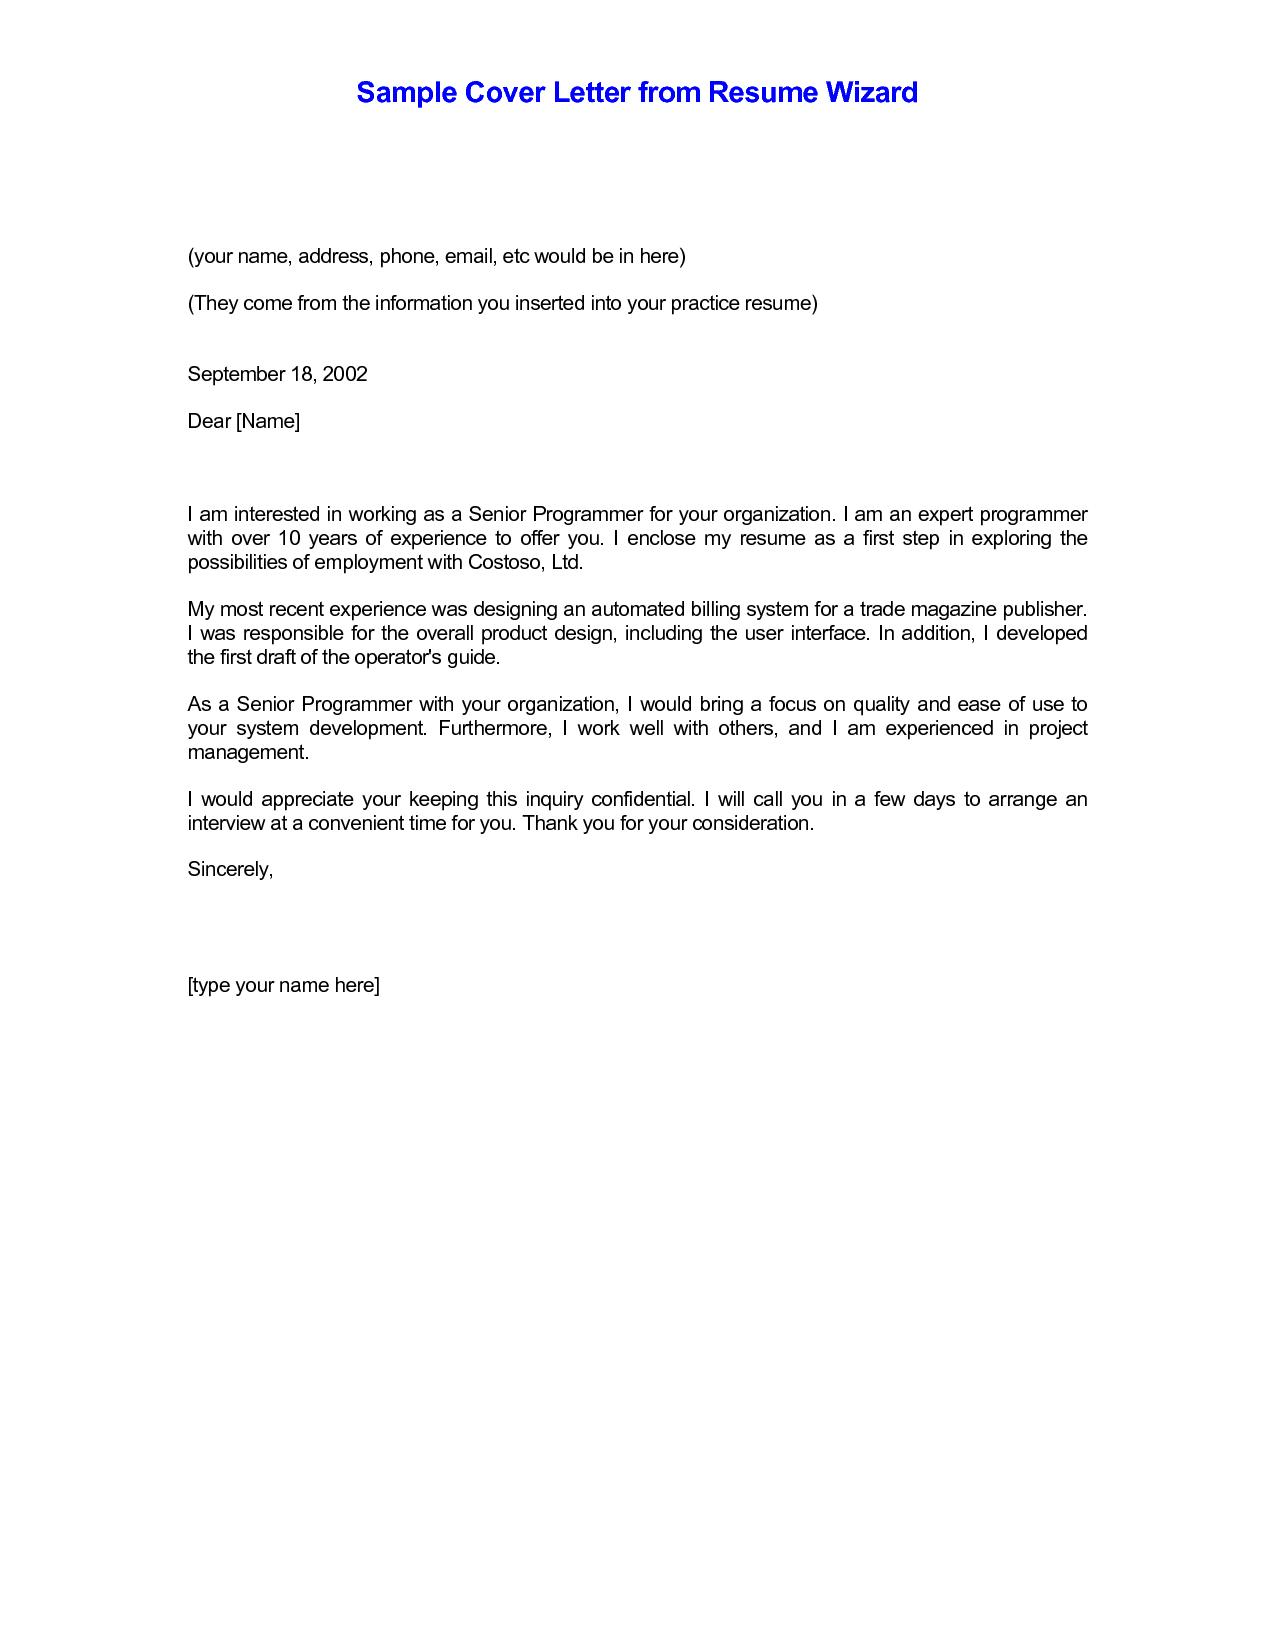 Essay writing service toronto   PHILPOWER Integrated